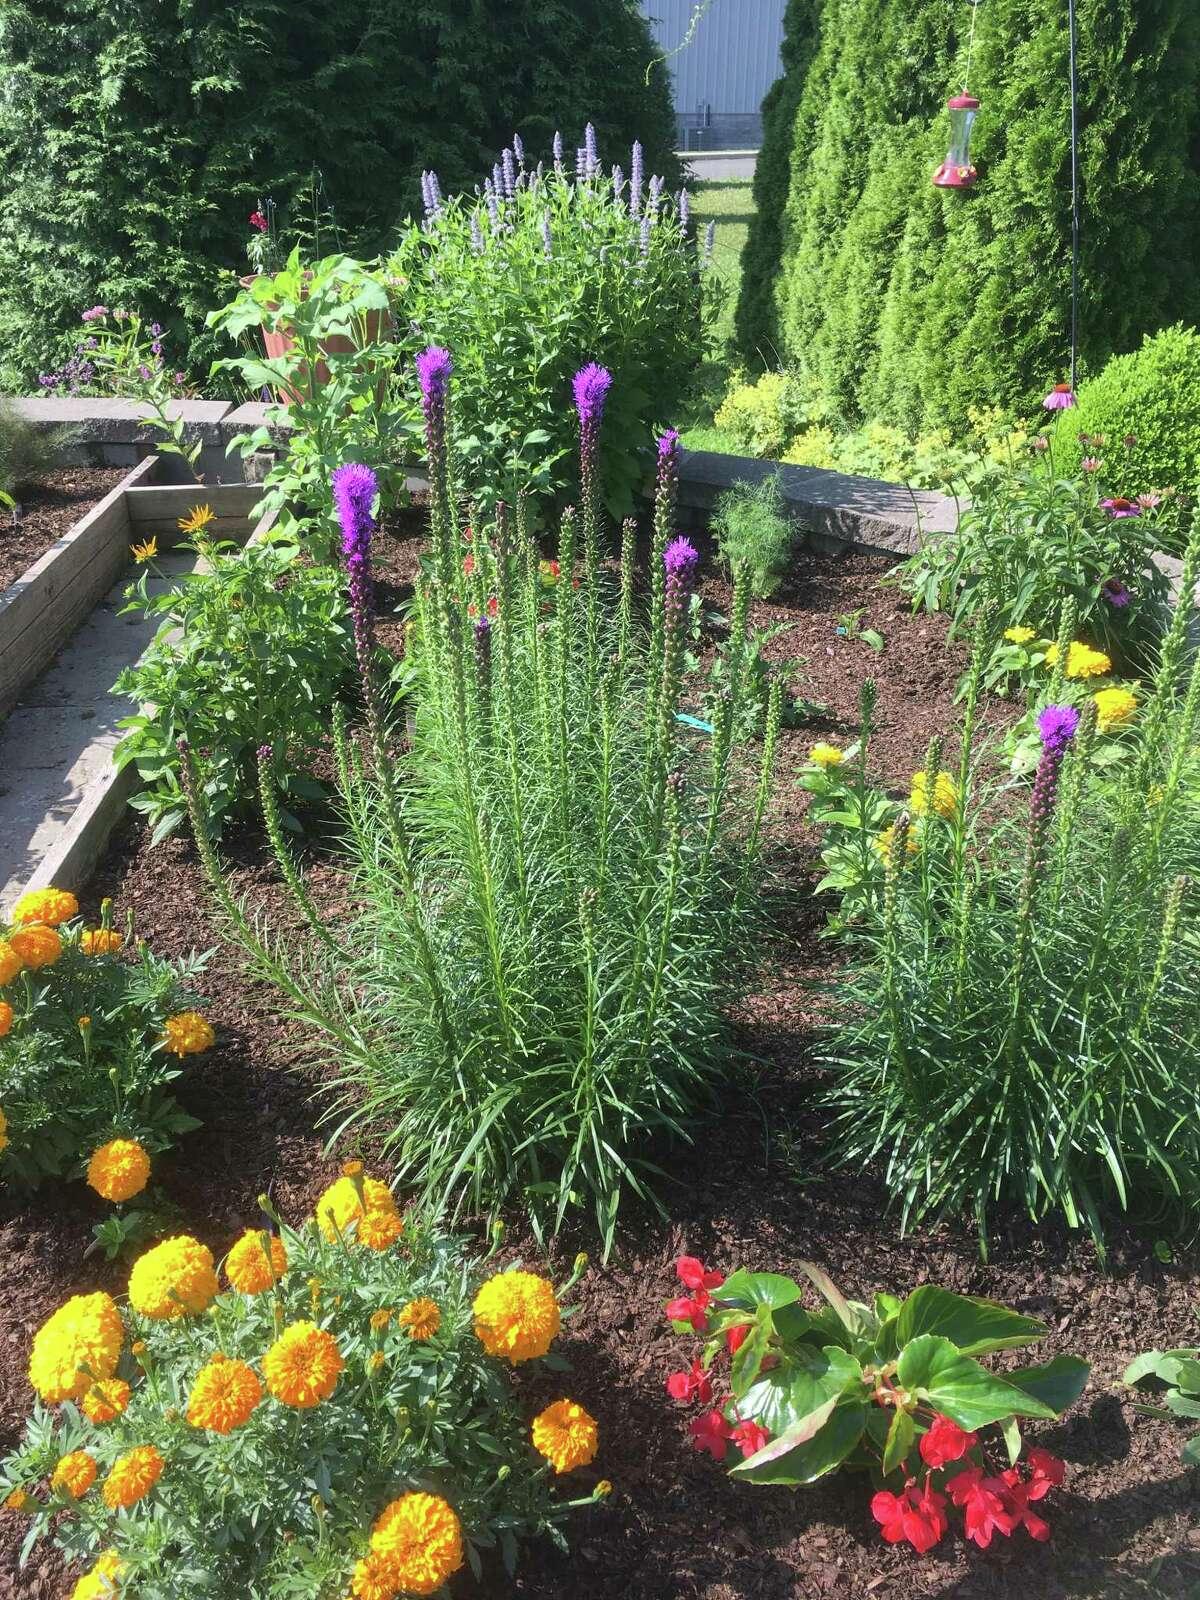 Galileo's Garden at New Milford High School